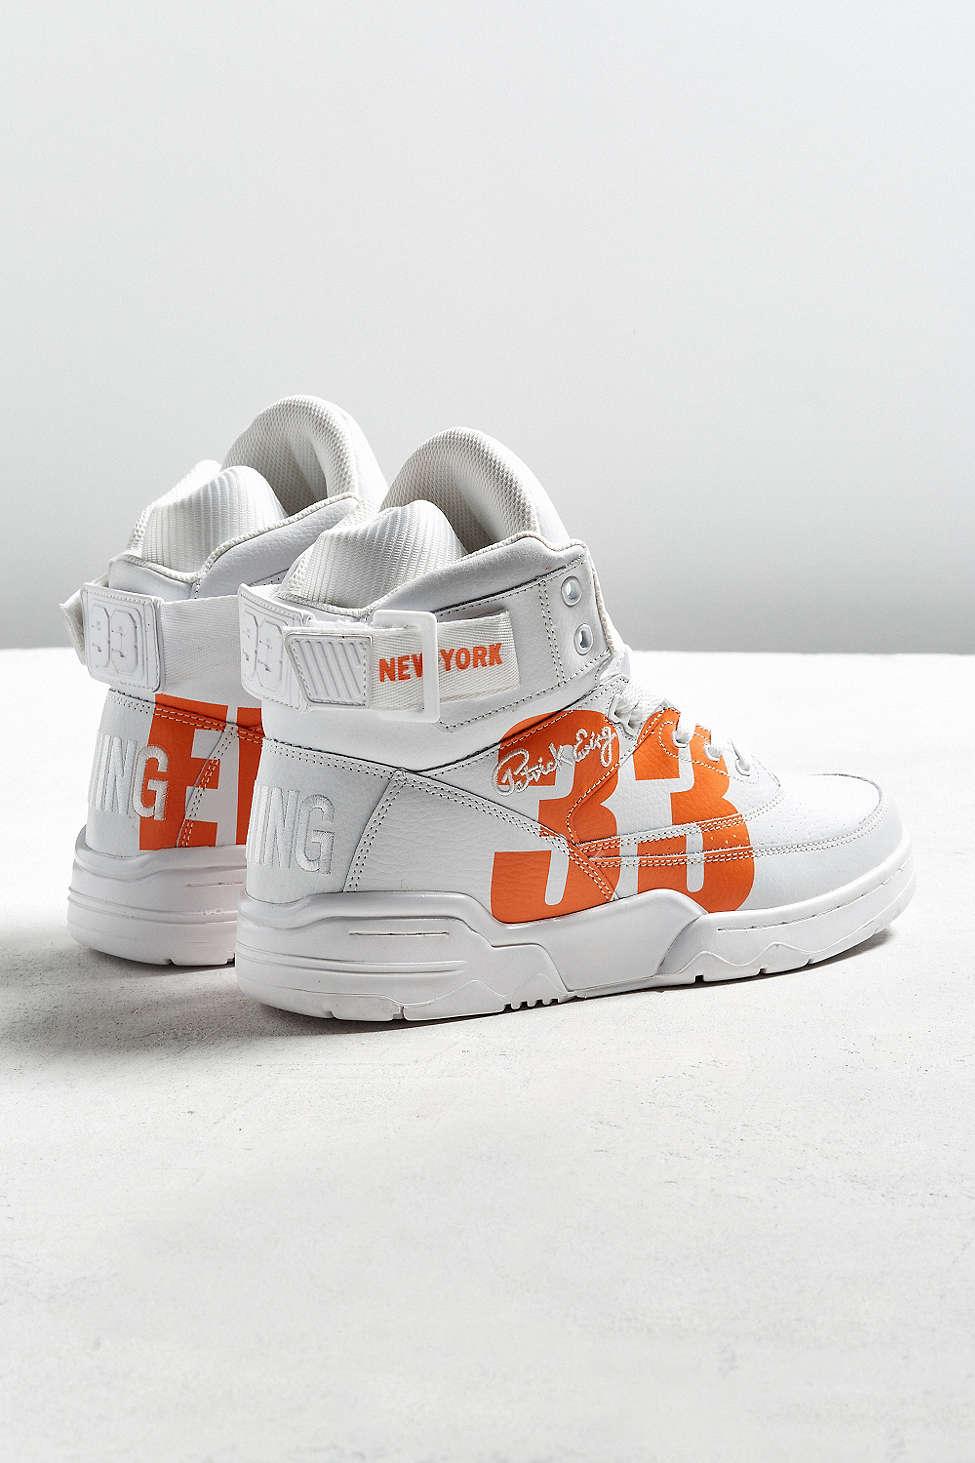 urban outfitters x ewing 33 hi NYC white orange 1